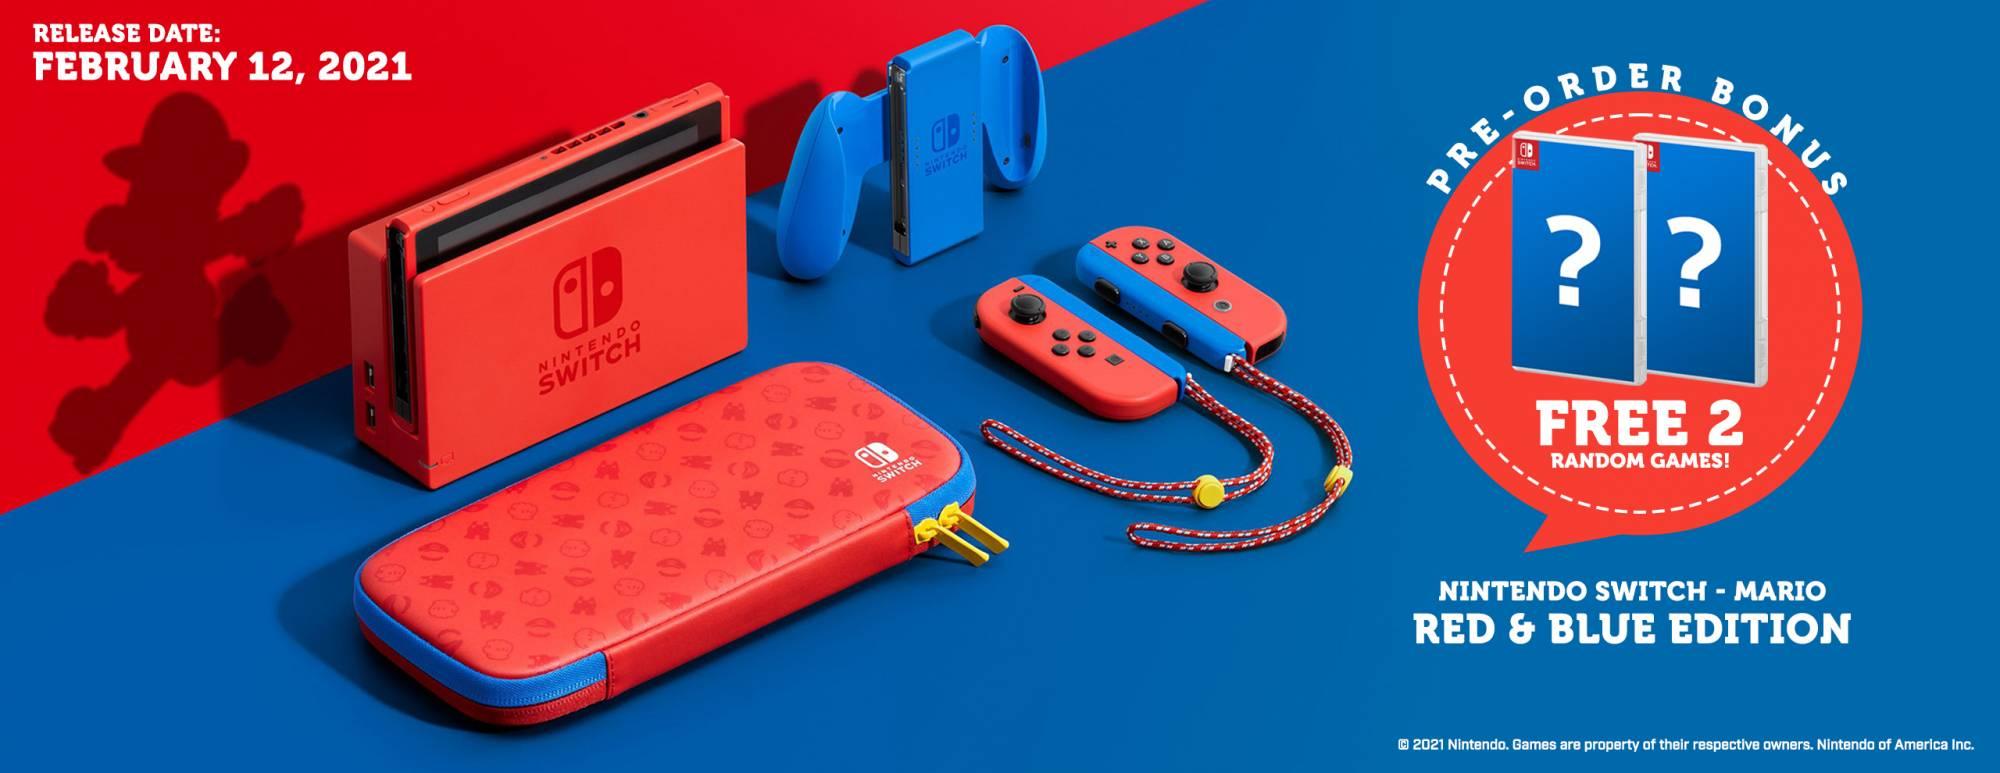 Switch Mario Edition